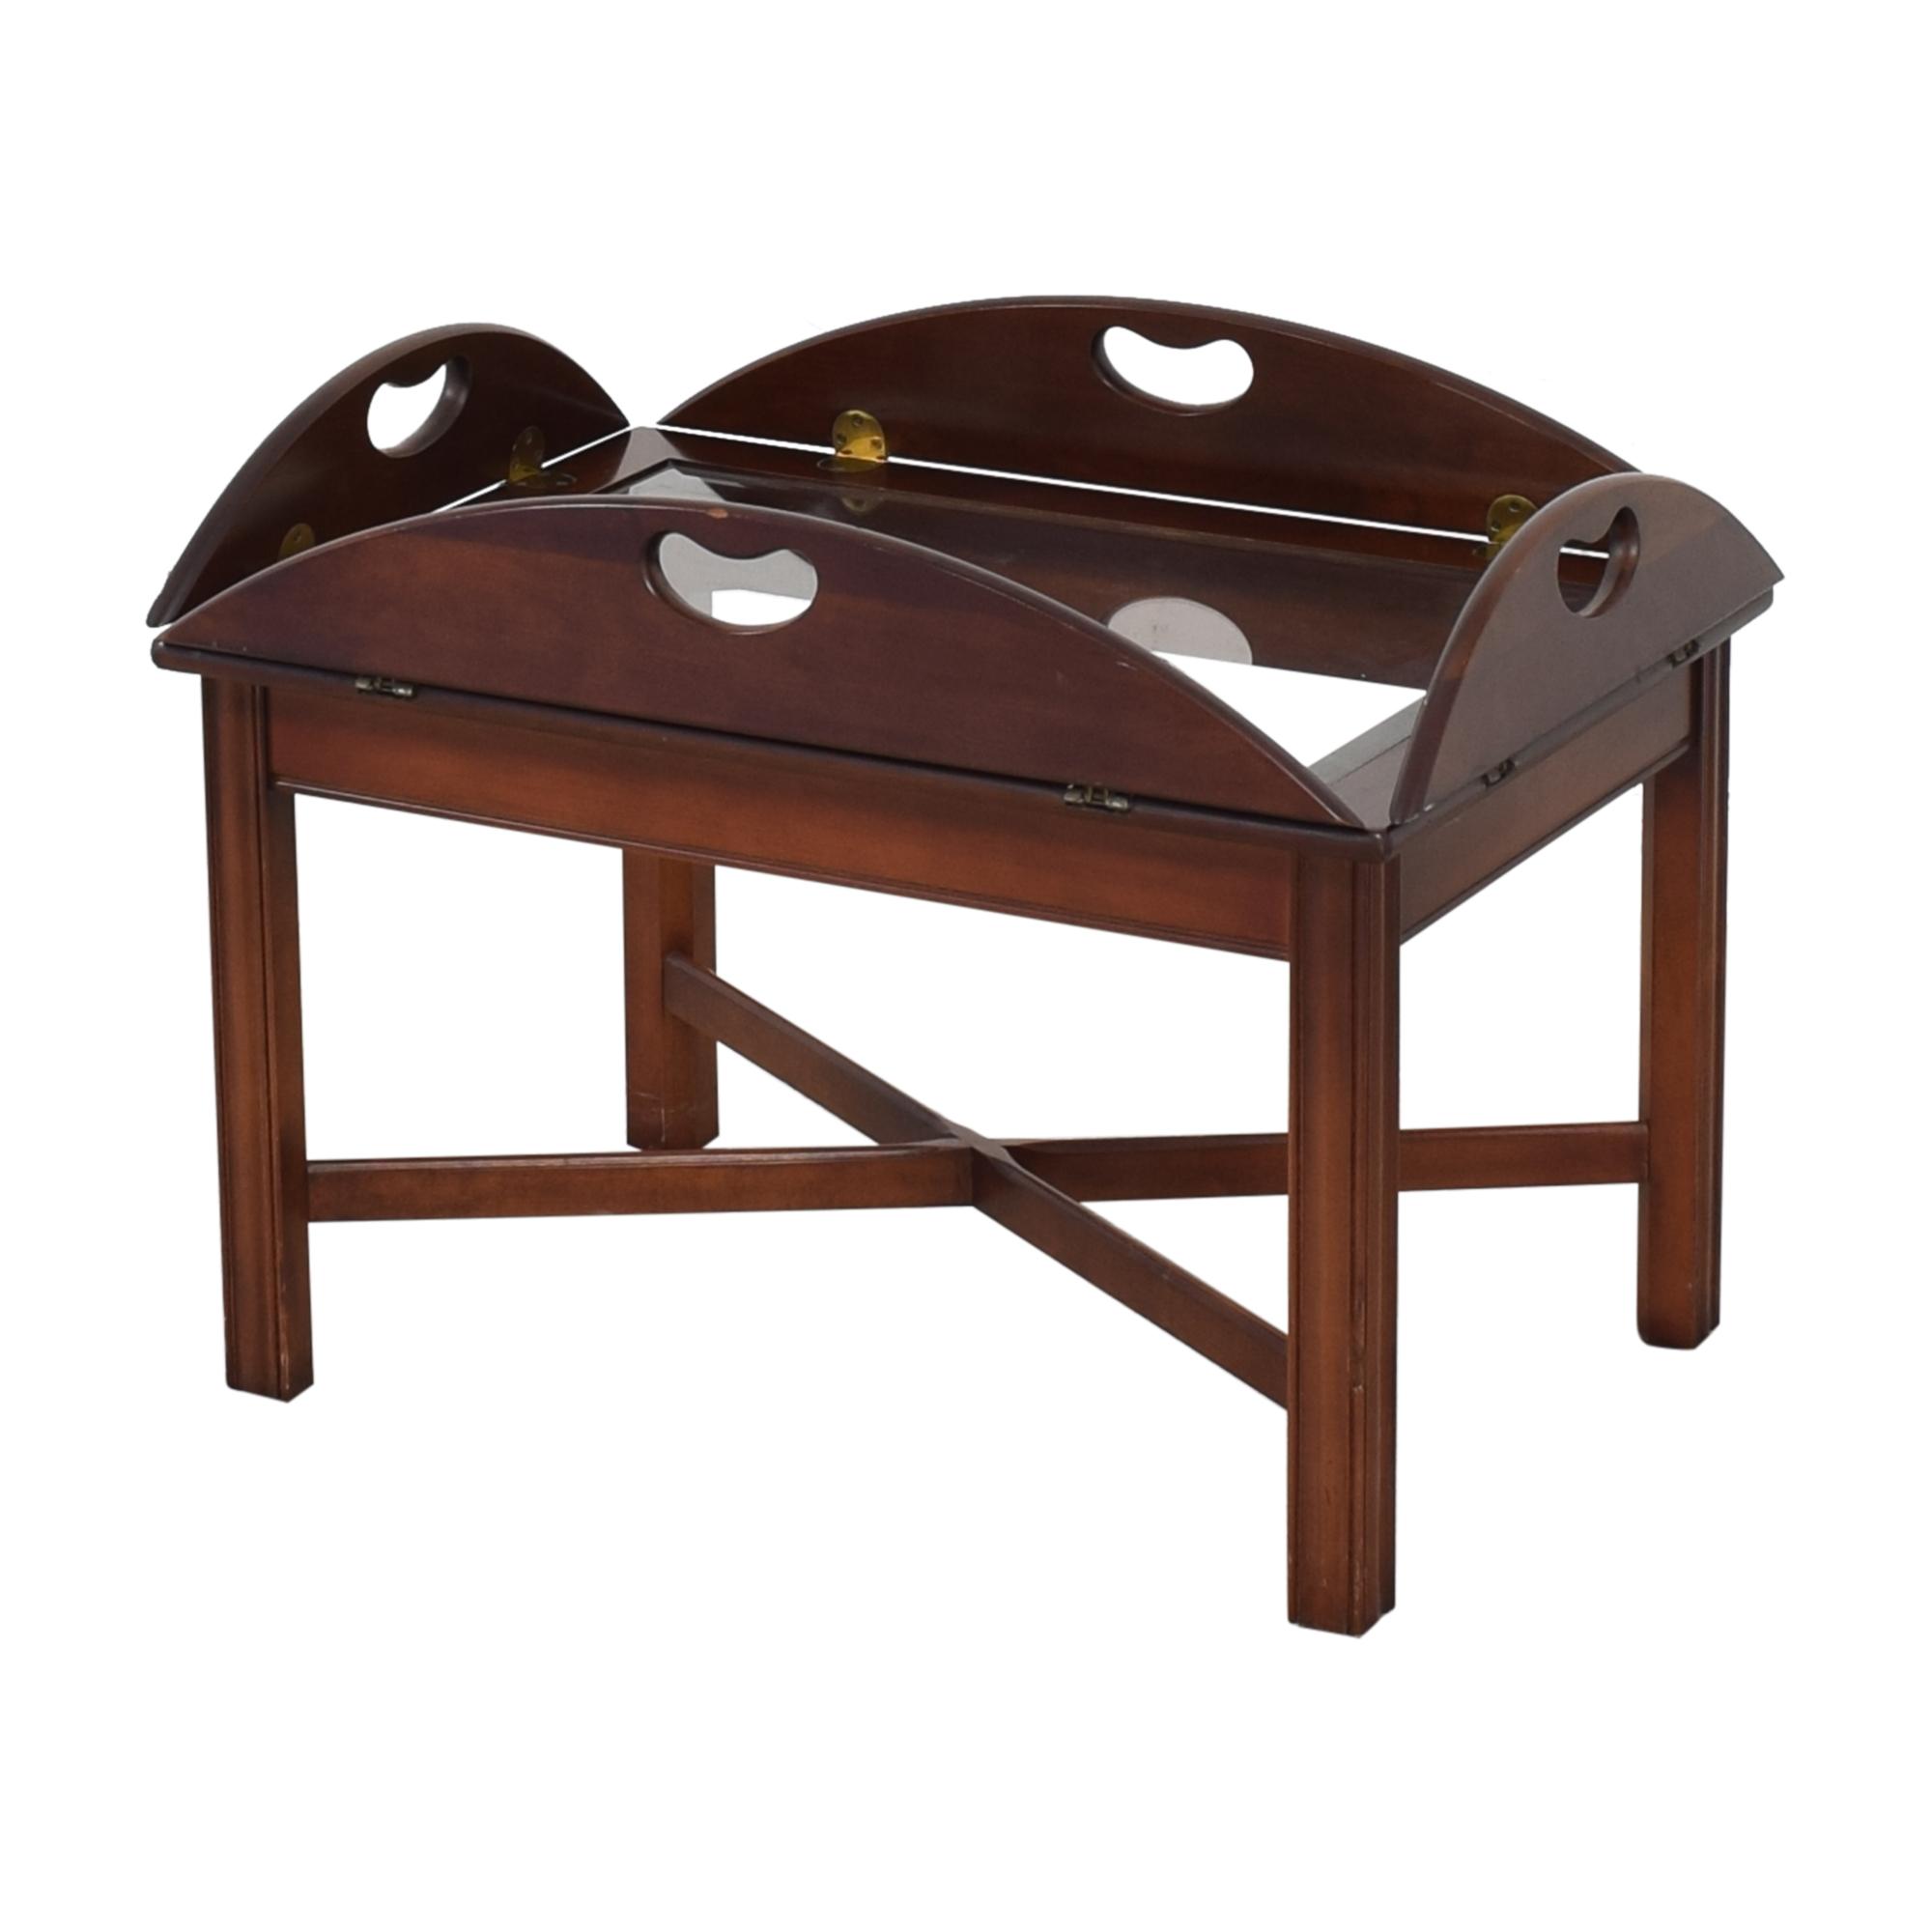 Huffman Koos Huffman Koos Fold Down Coffee Table on sale